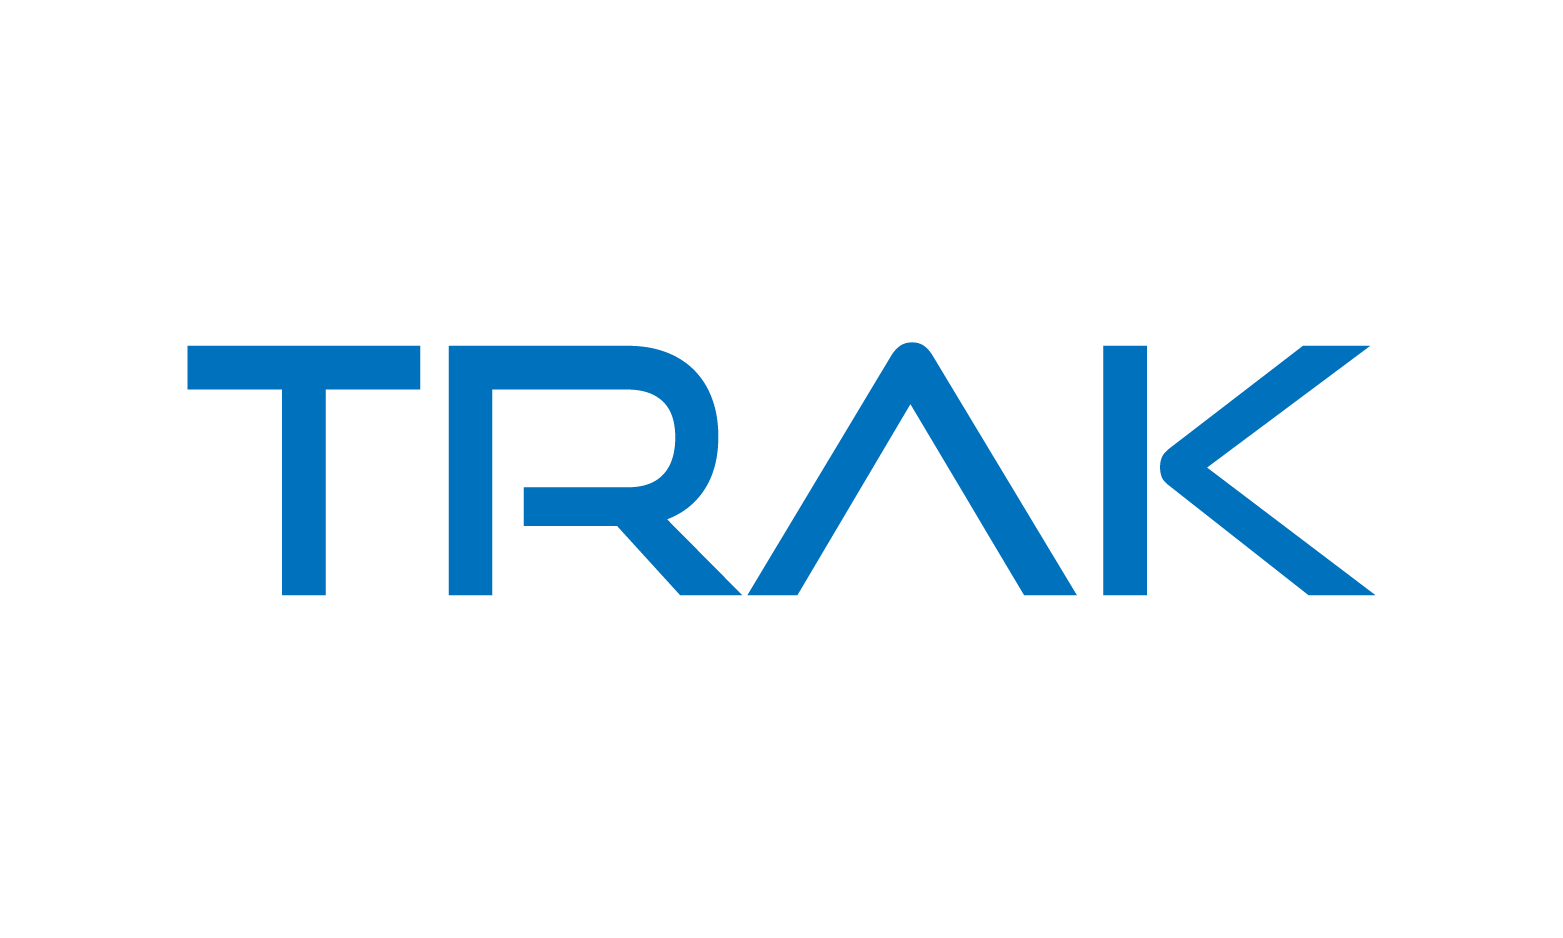 Trak.co